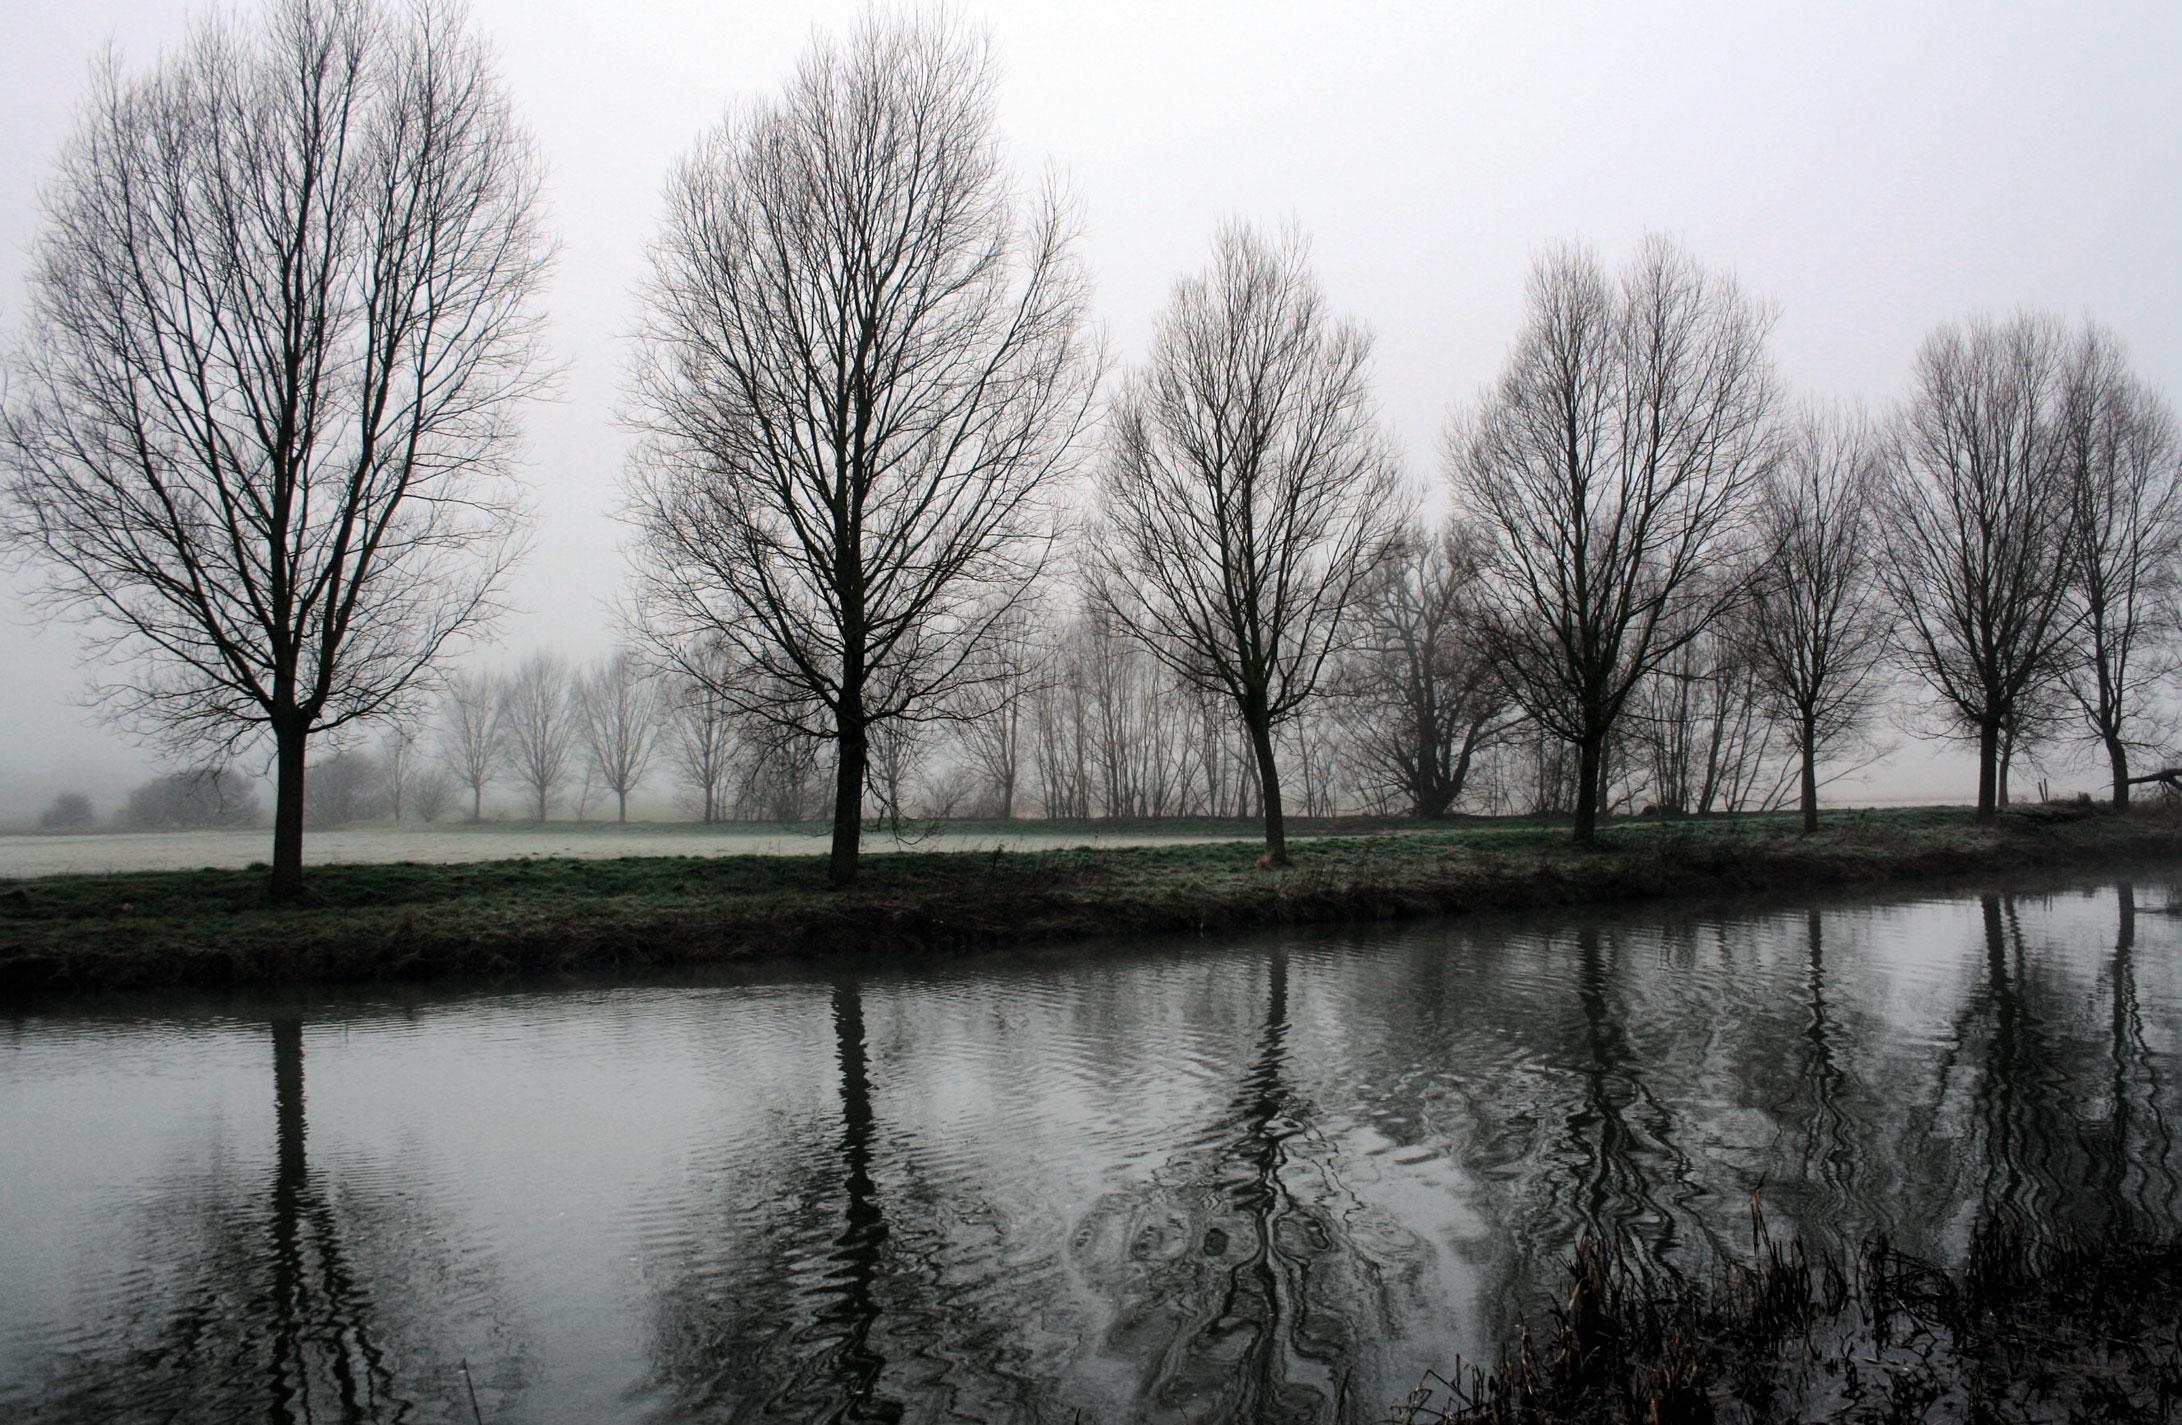 Mill-Tye-Gallery-Winter-Cold